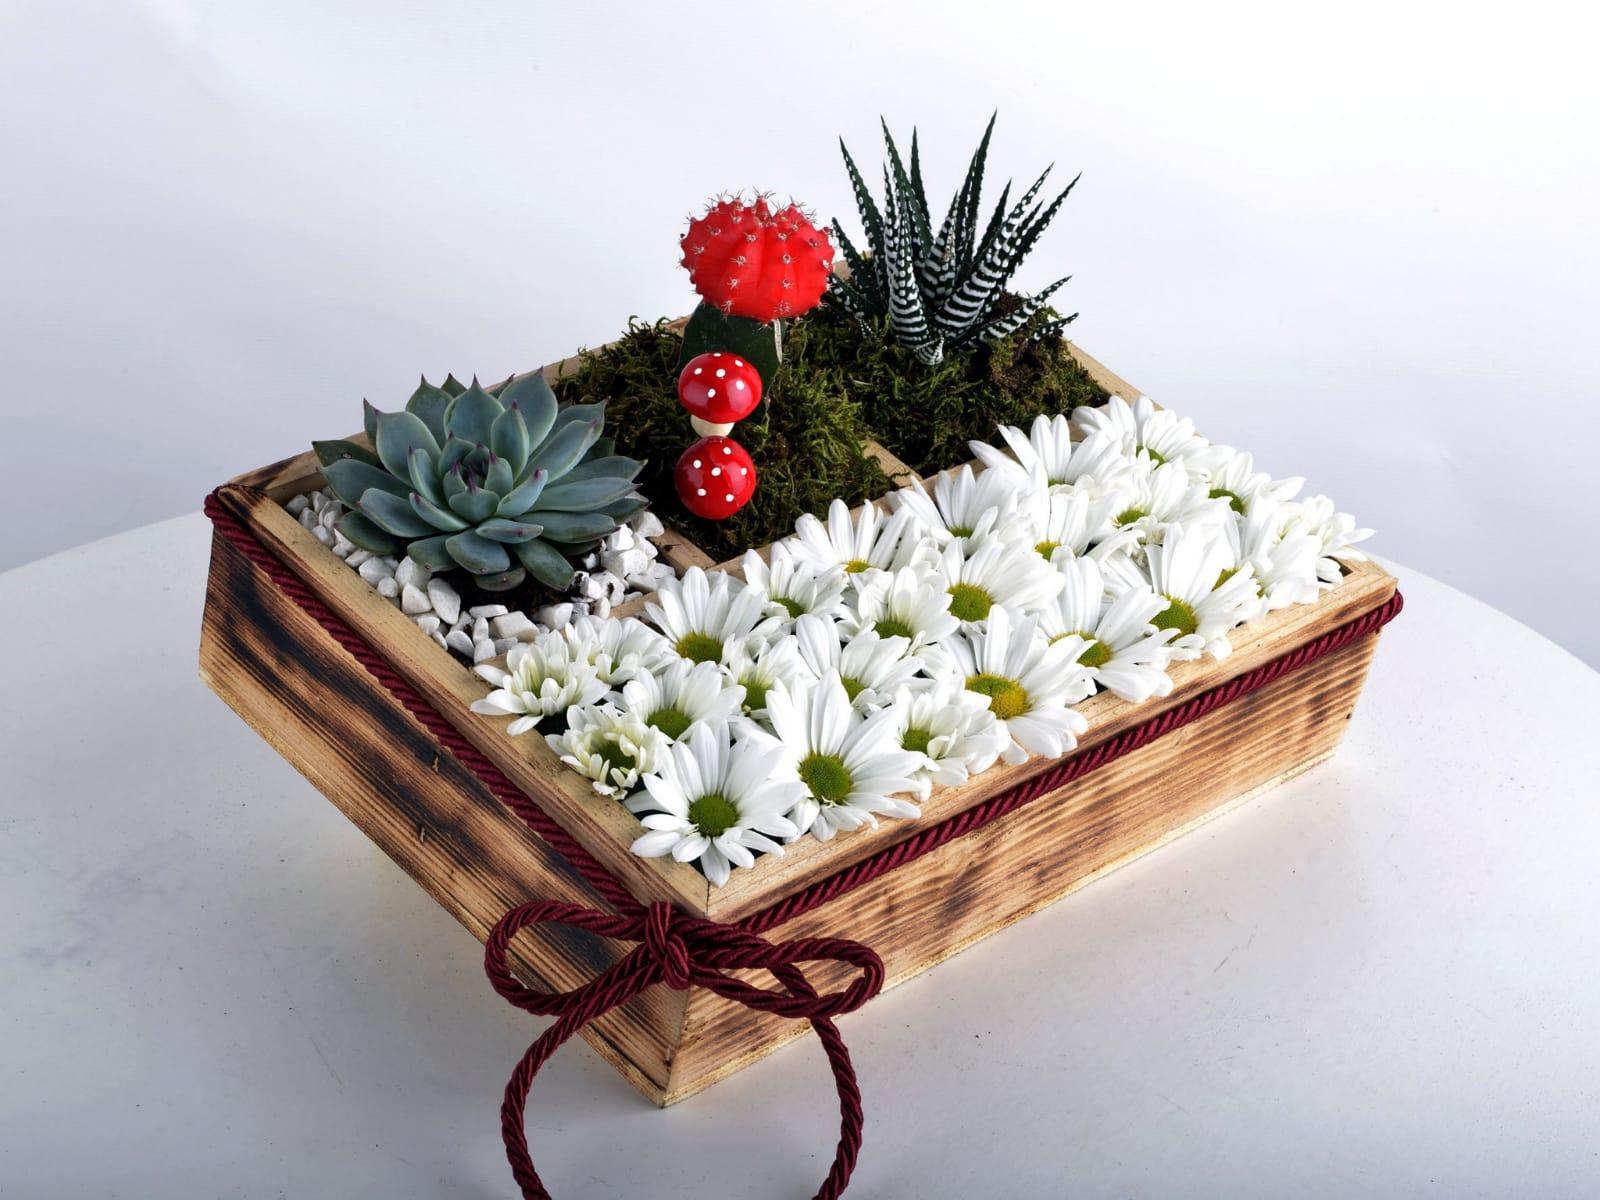 Bölmeli kutuda sukulent papatya arajmaný